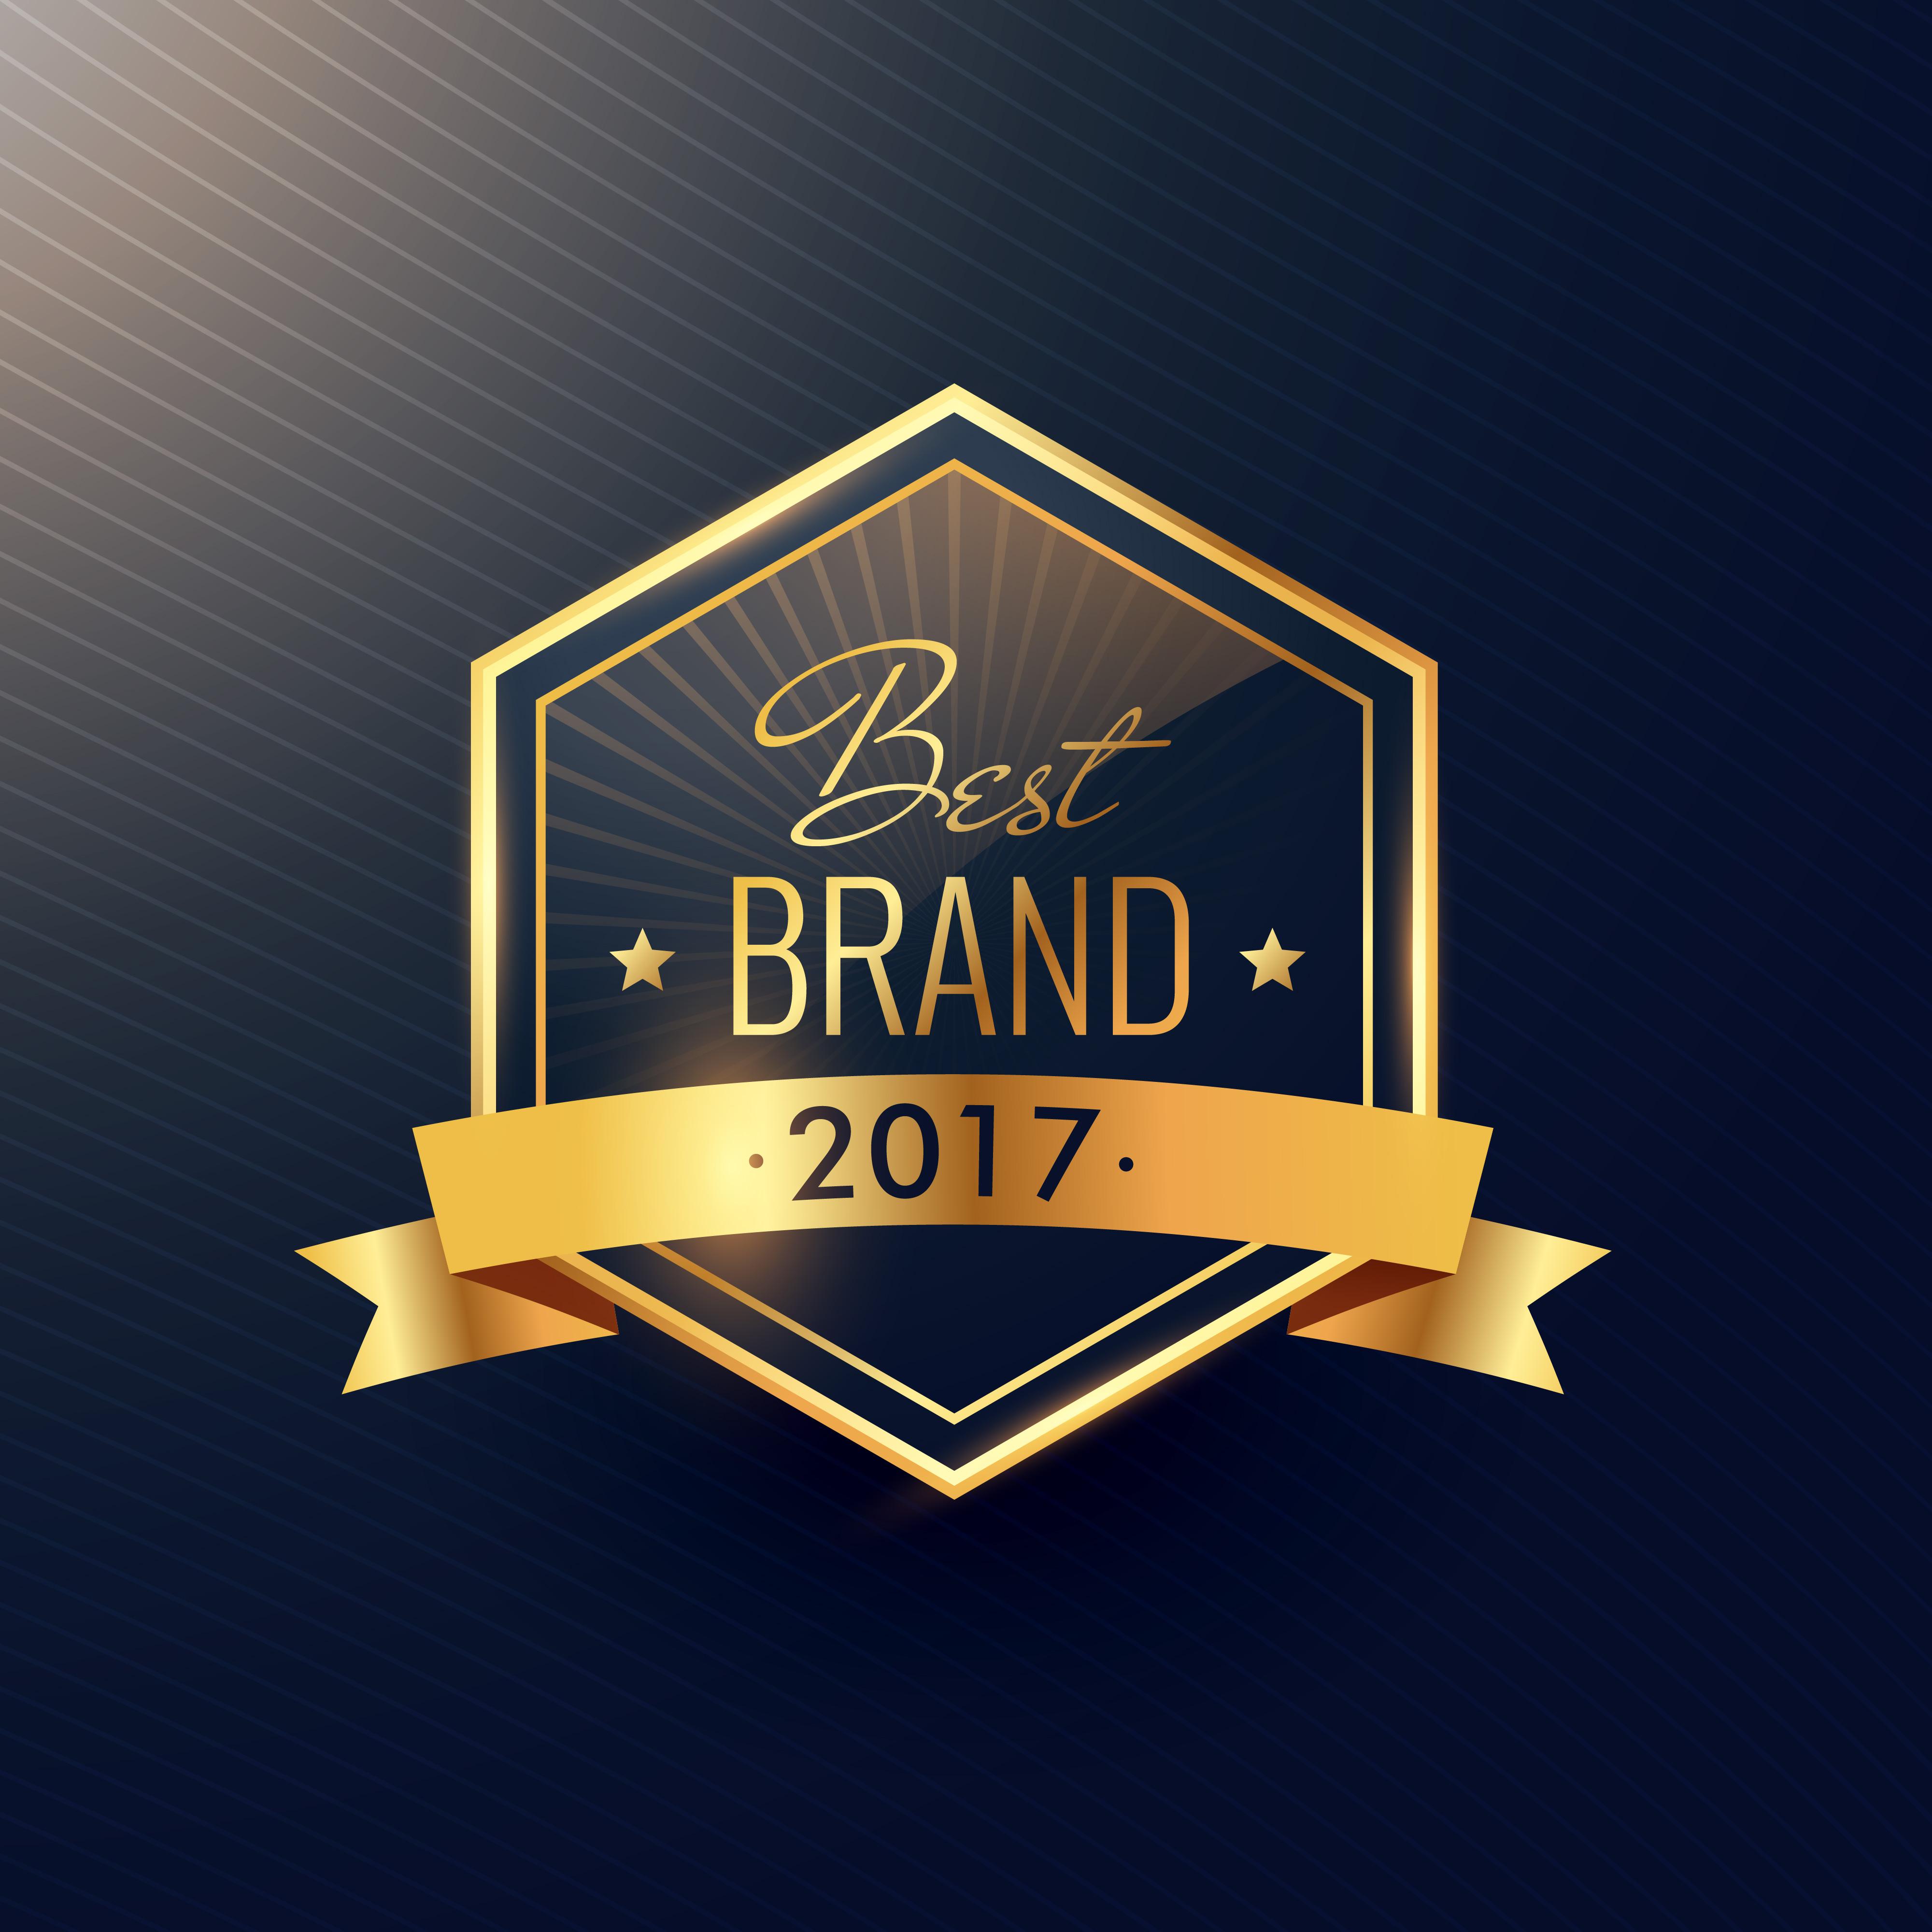 best brand of 2017 golden label design - Download Free ...